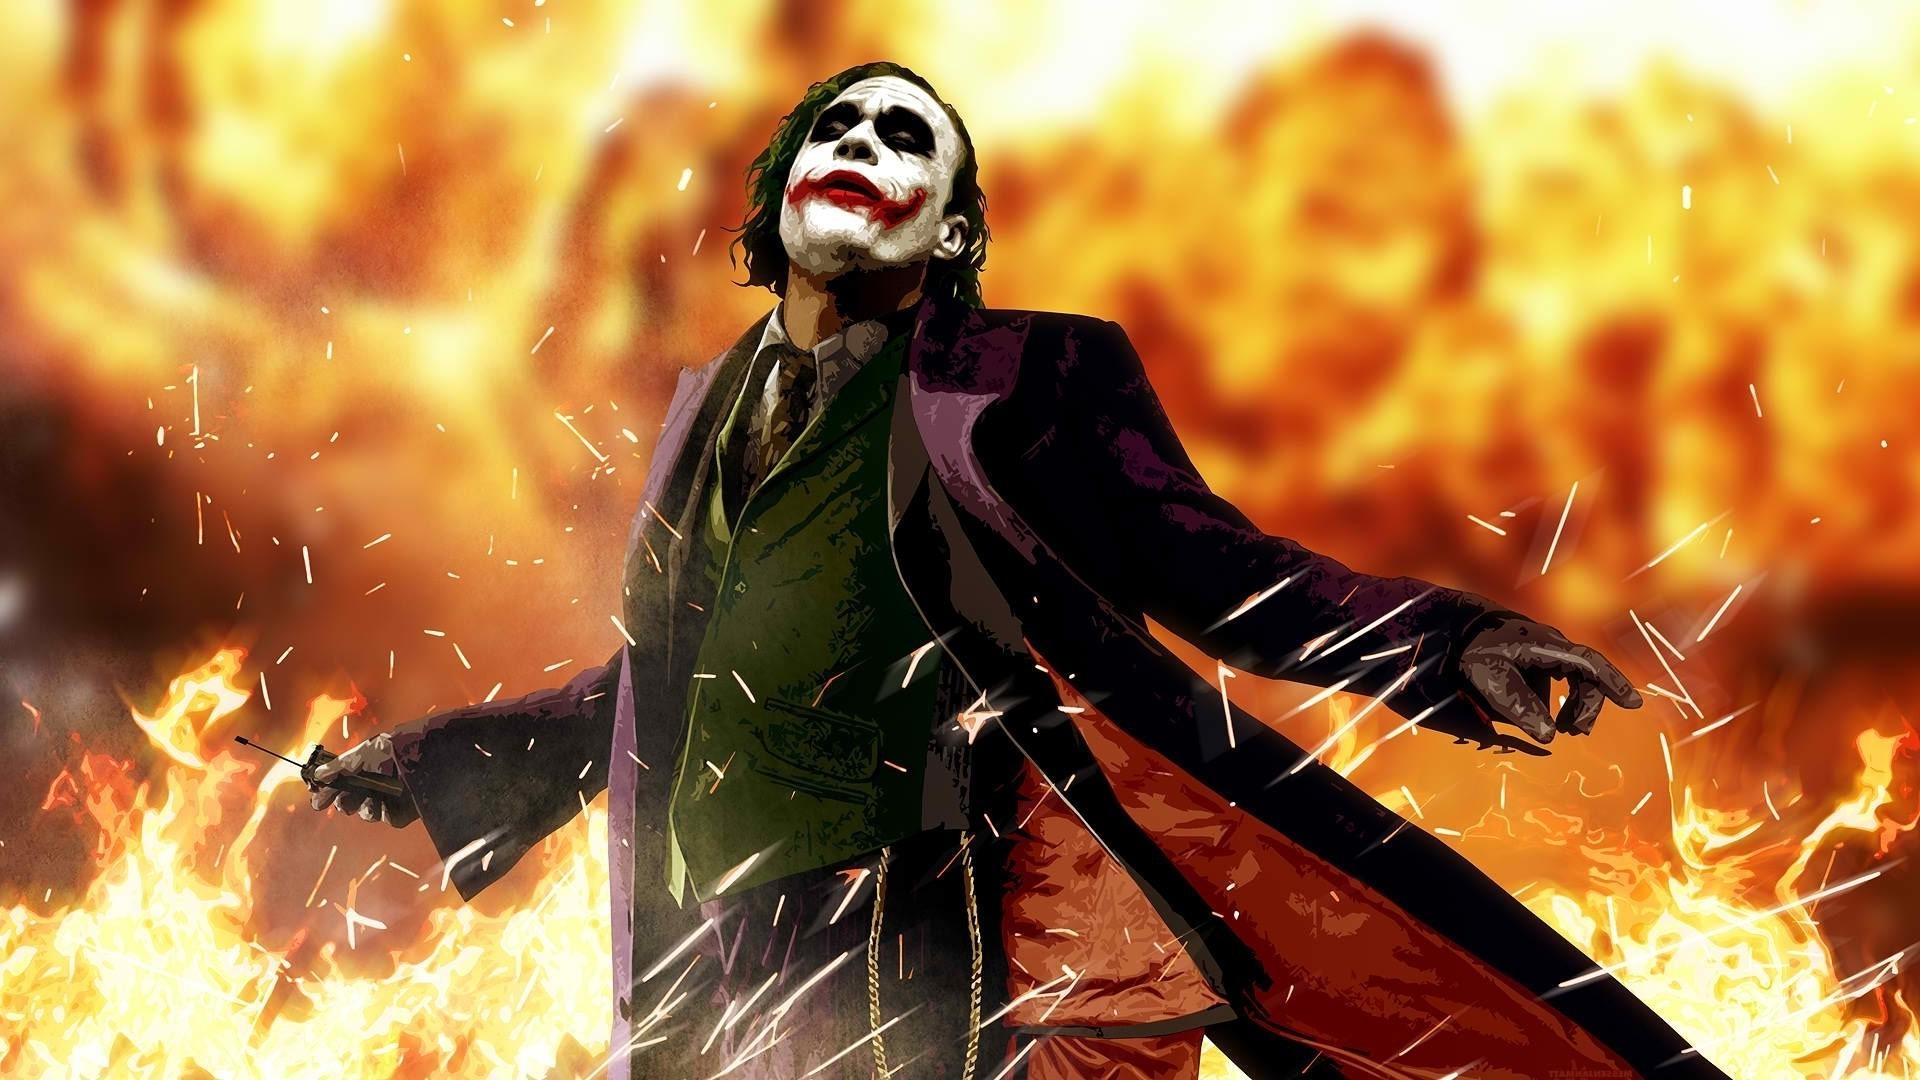 anime, Heath Ledger, Movies, Joker, Batman, The Dark Knight Wallpapers HD /  Desktop and Mobile Backgrounds